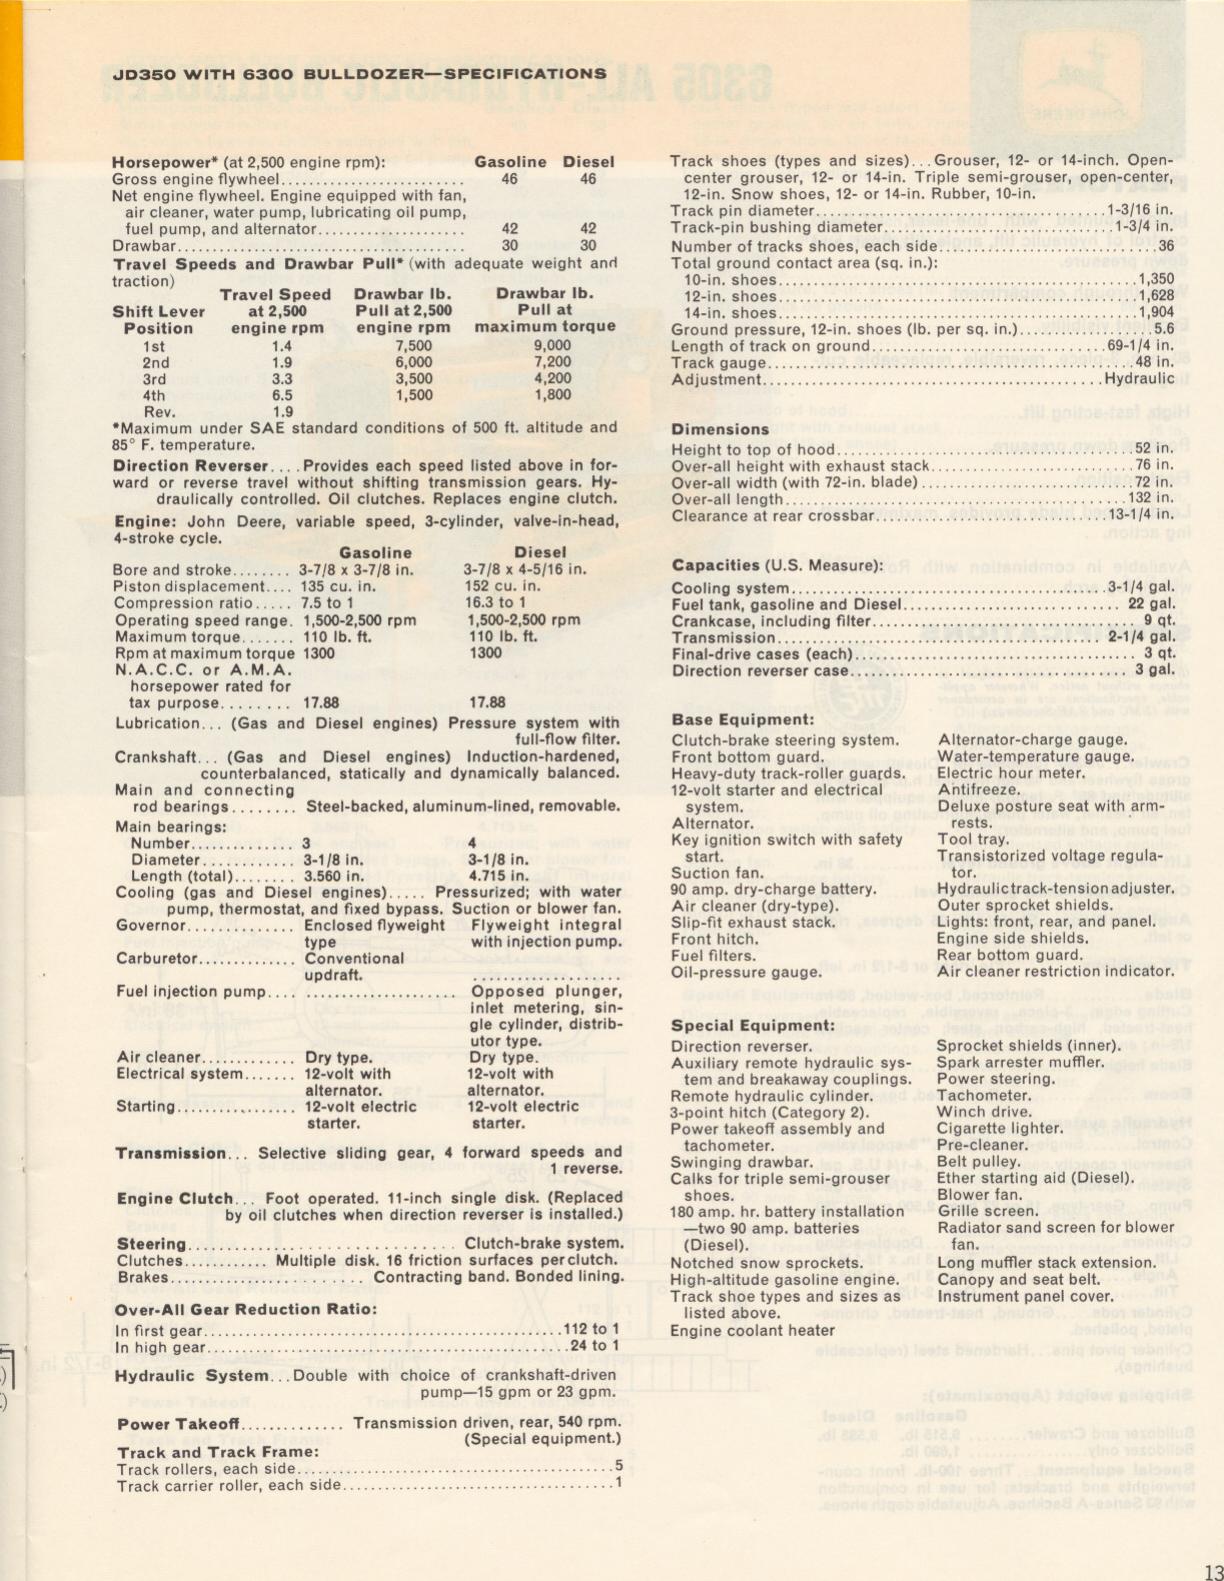 John Deere 6300 Users Manual